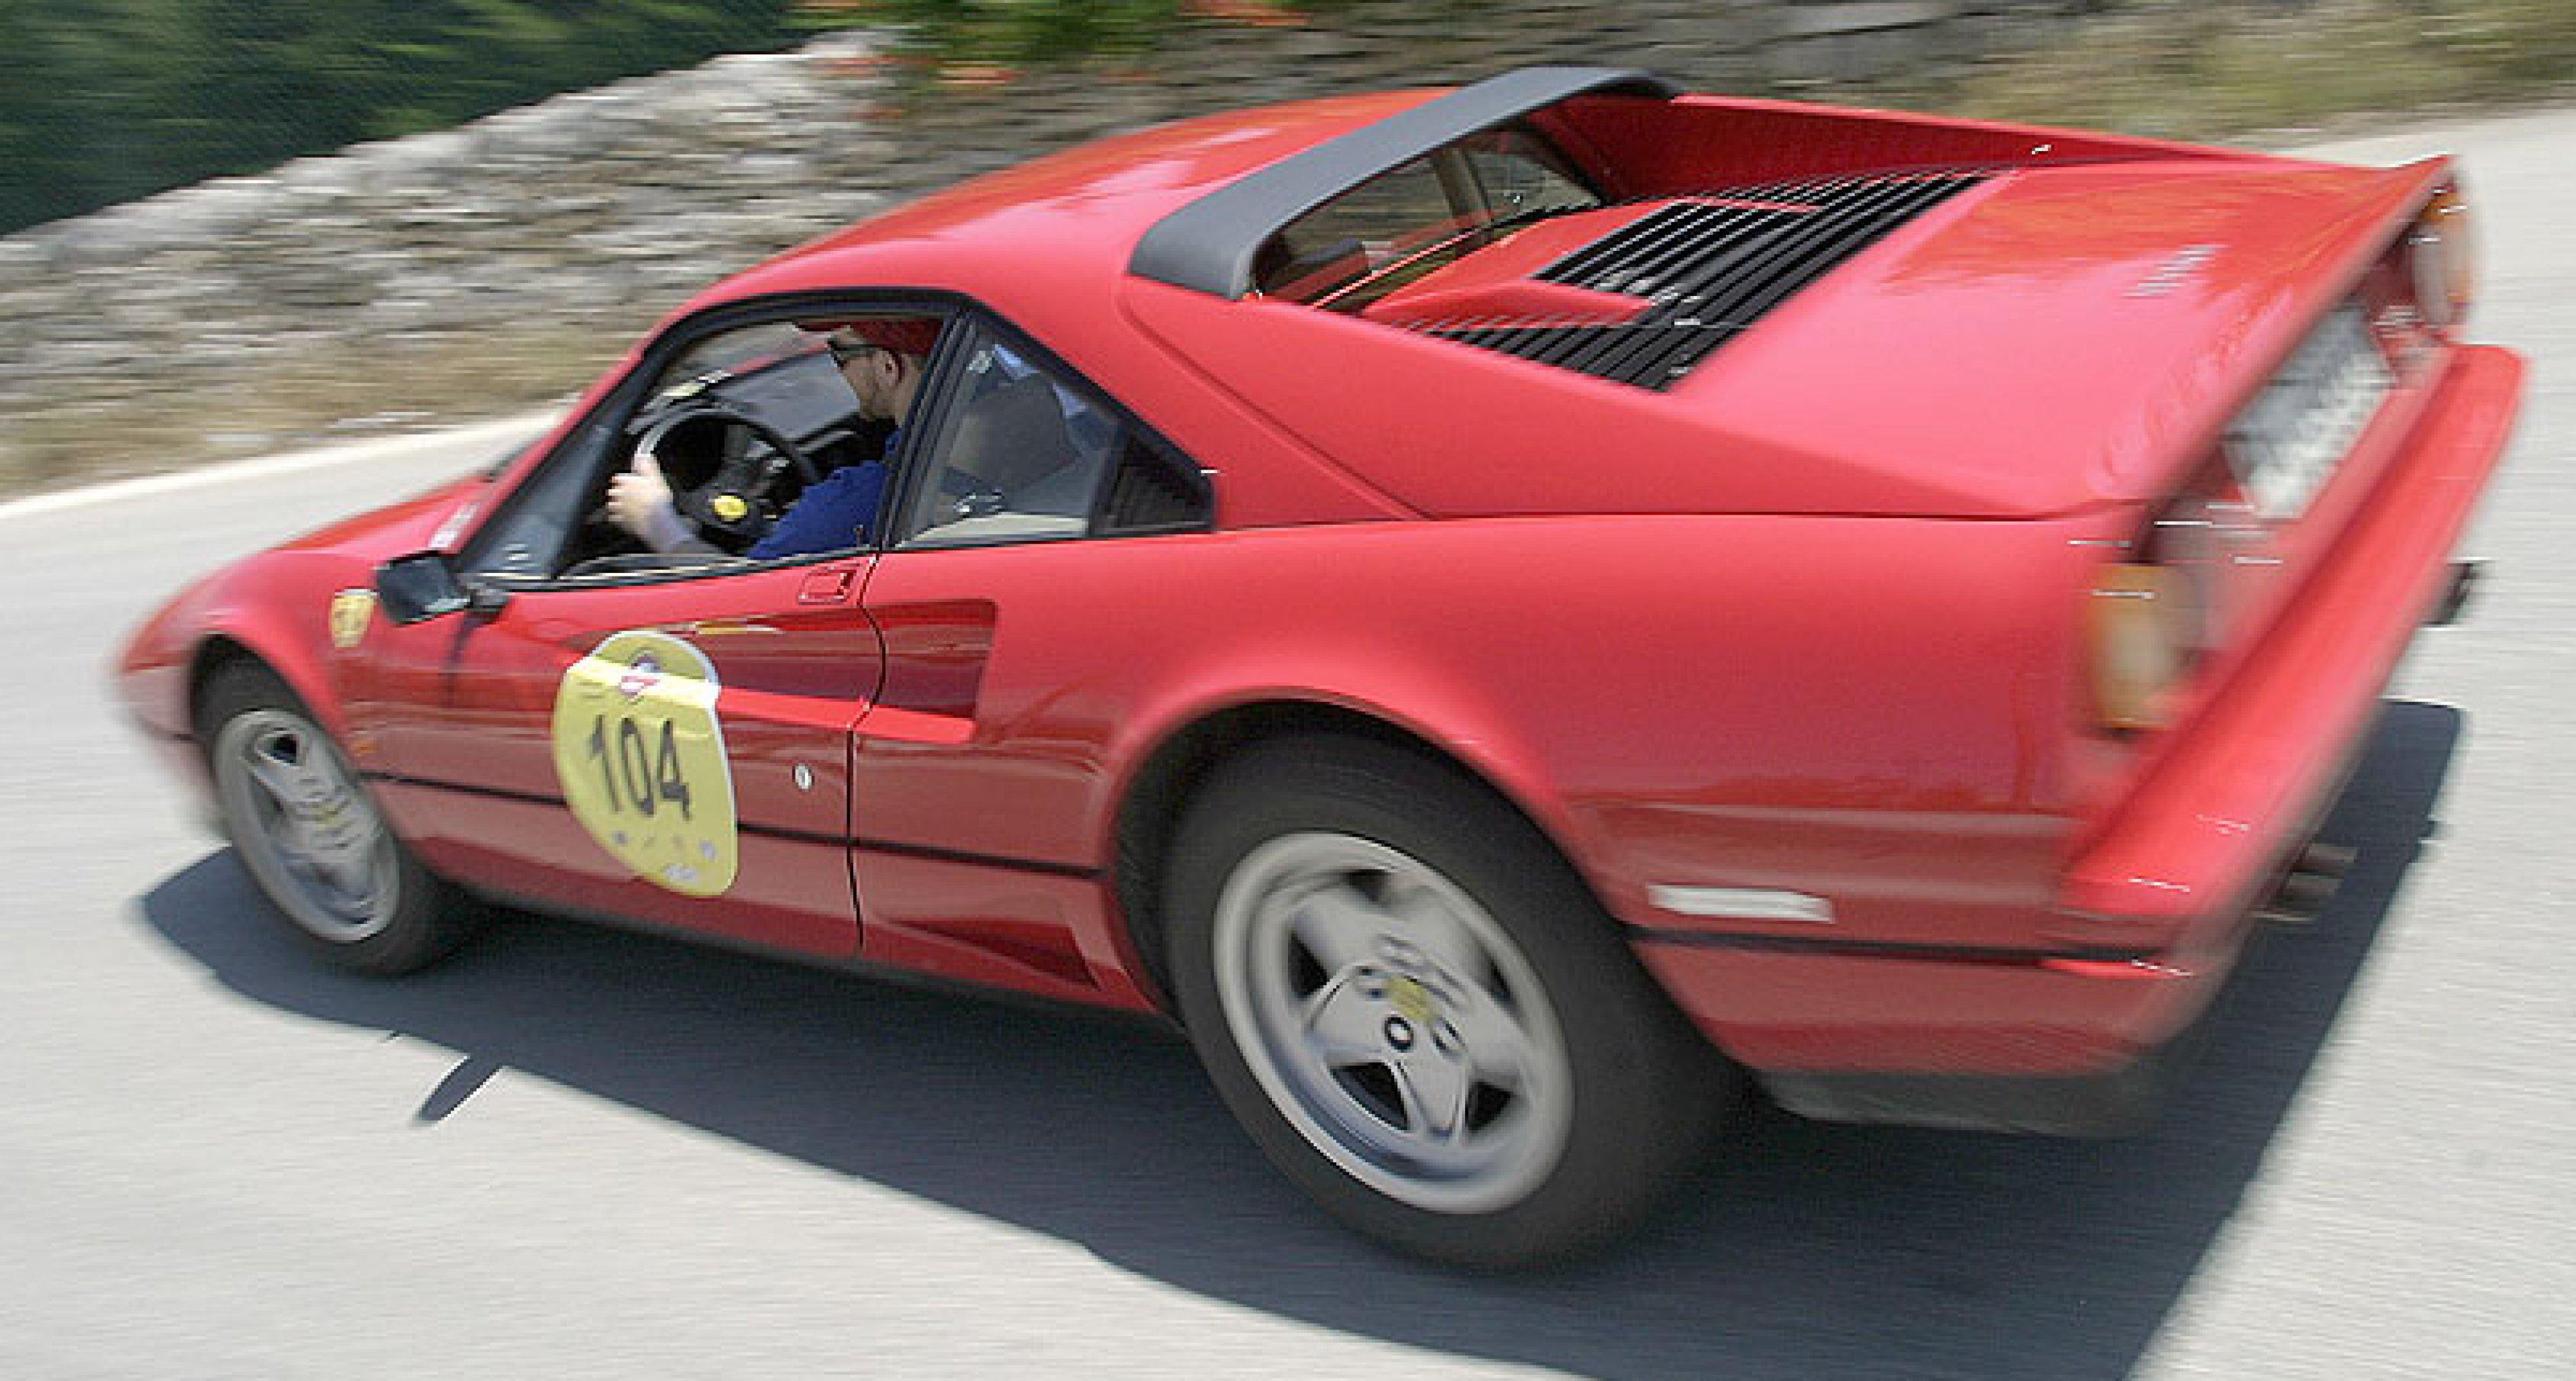 Giro Di Sicilia - Targa Florio 4 - 11 June 2007